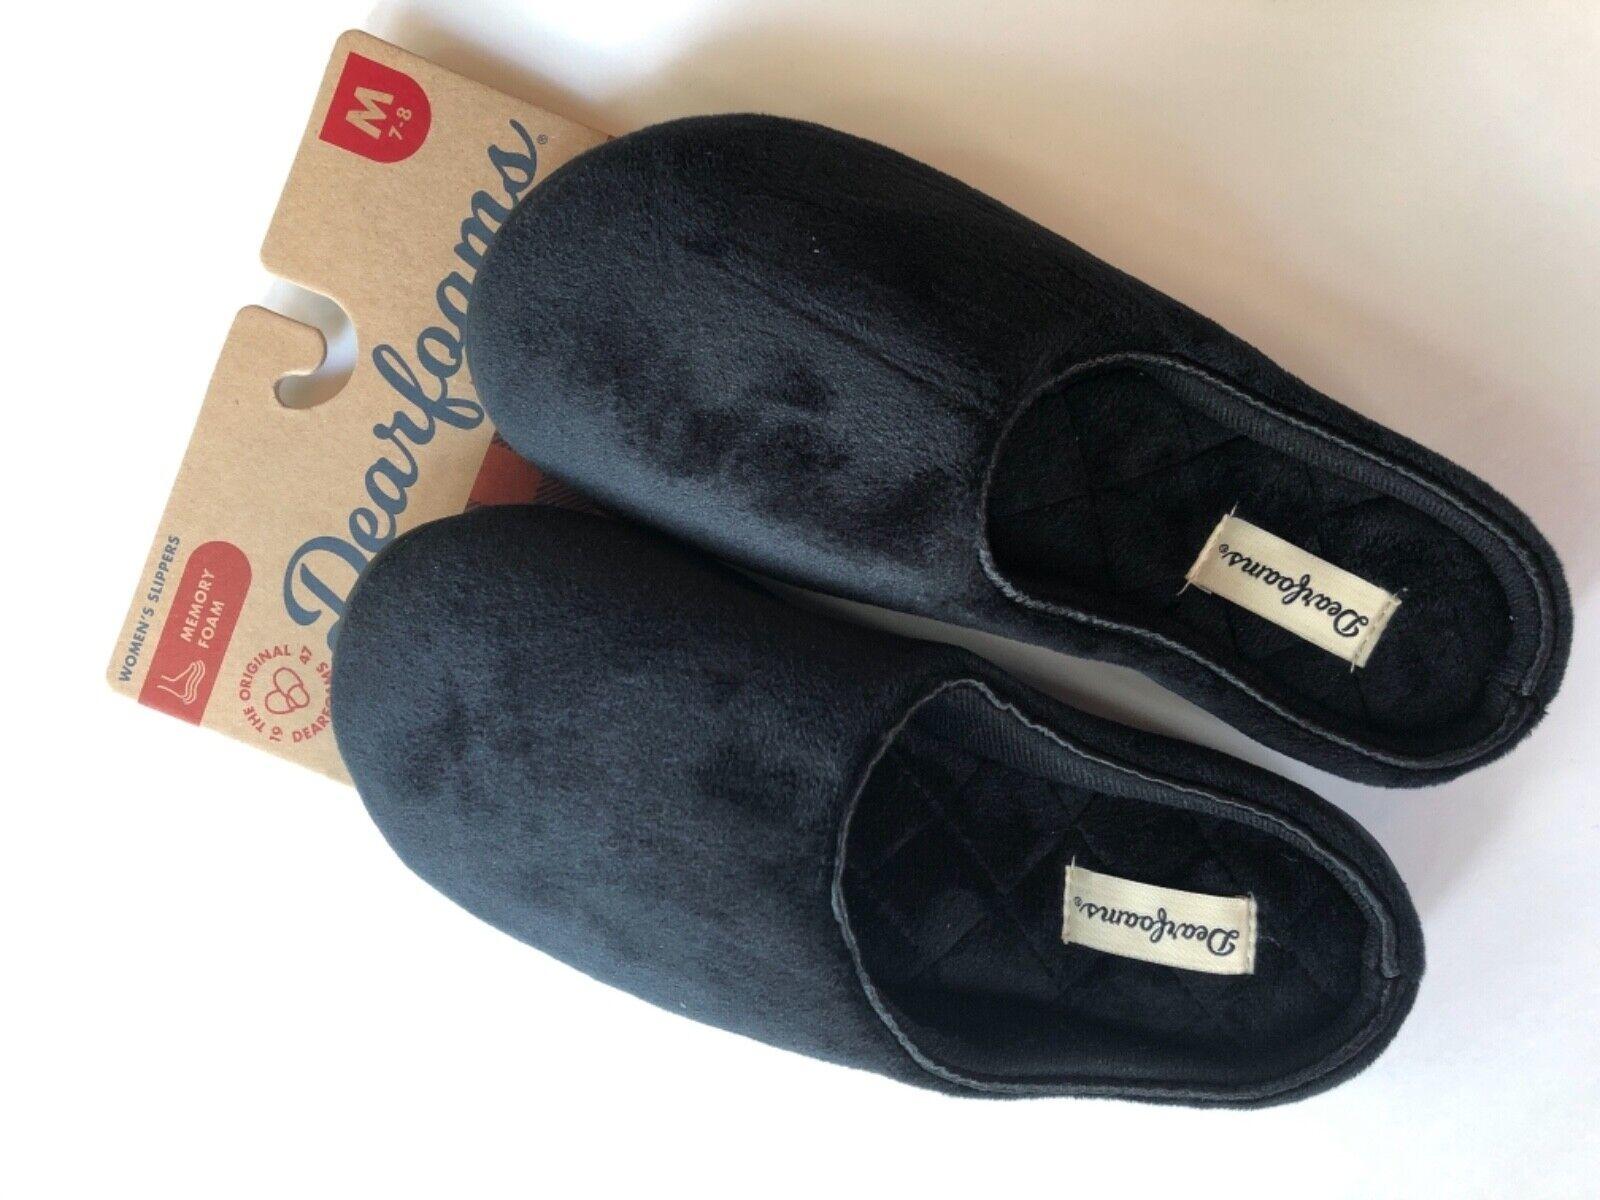 New Dearfoams Genuine Beautiful Super Soft Black Women's Slippers - US 7 Medium